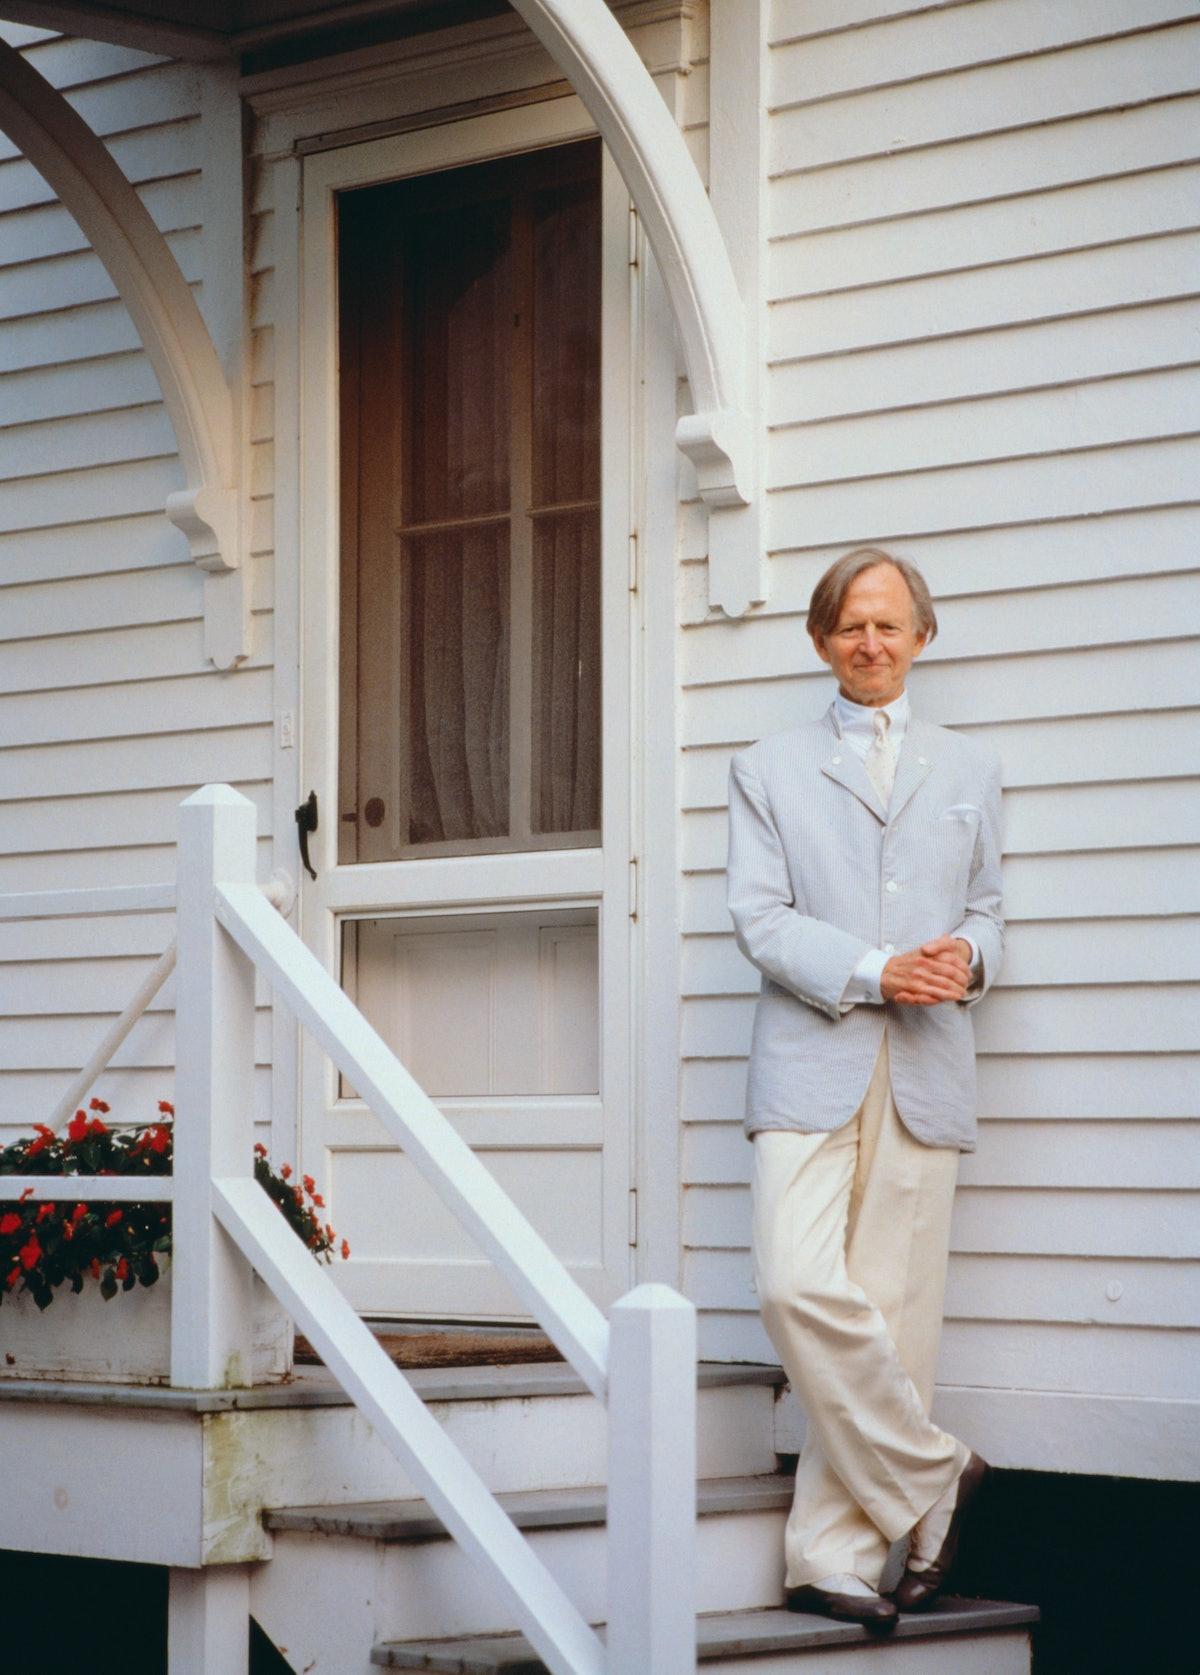 Novelist Tom Wolfe Standing on Steps